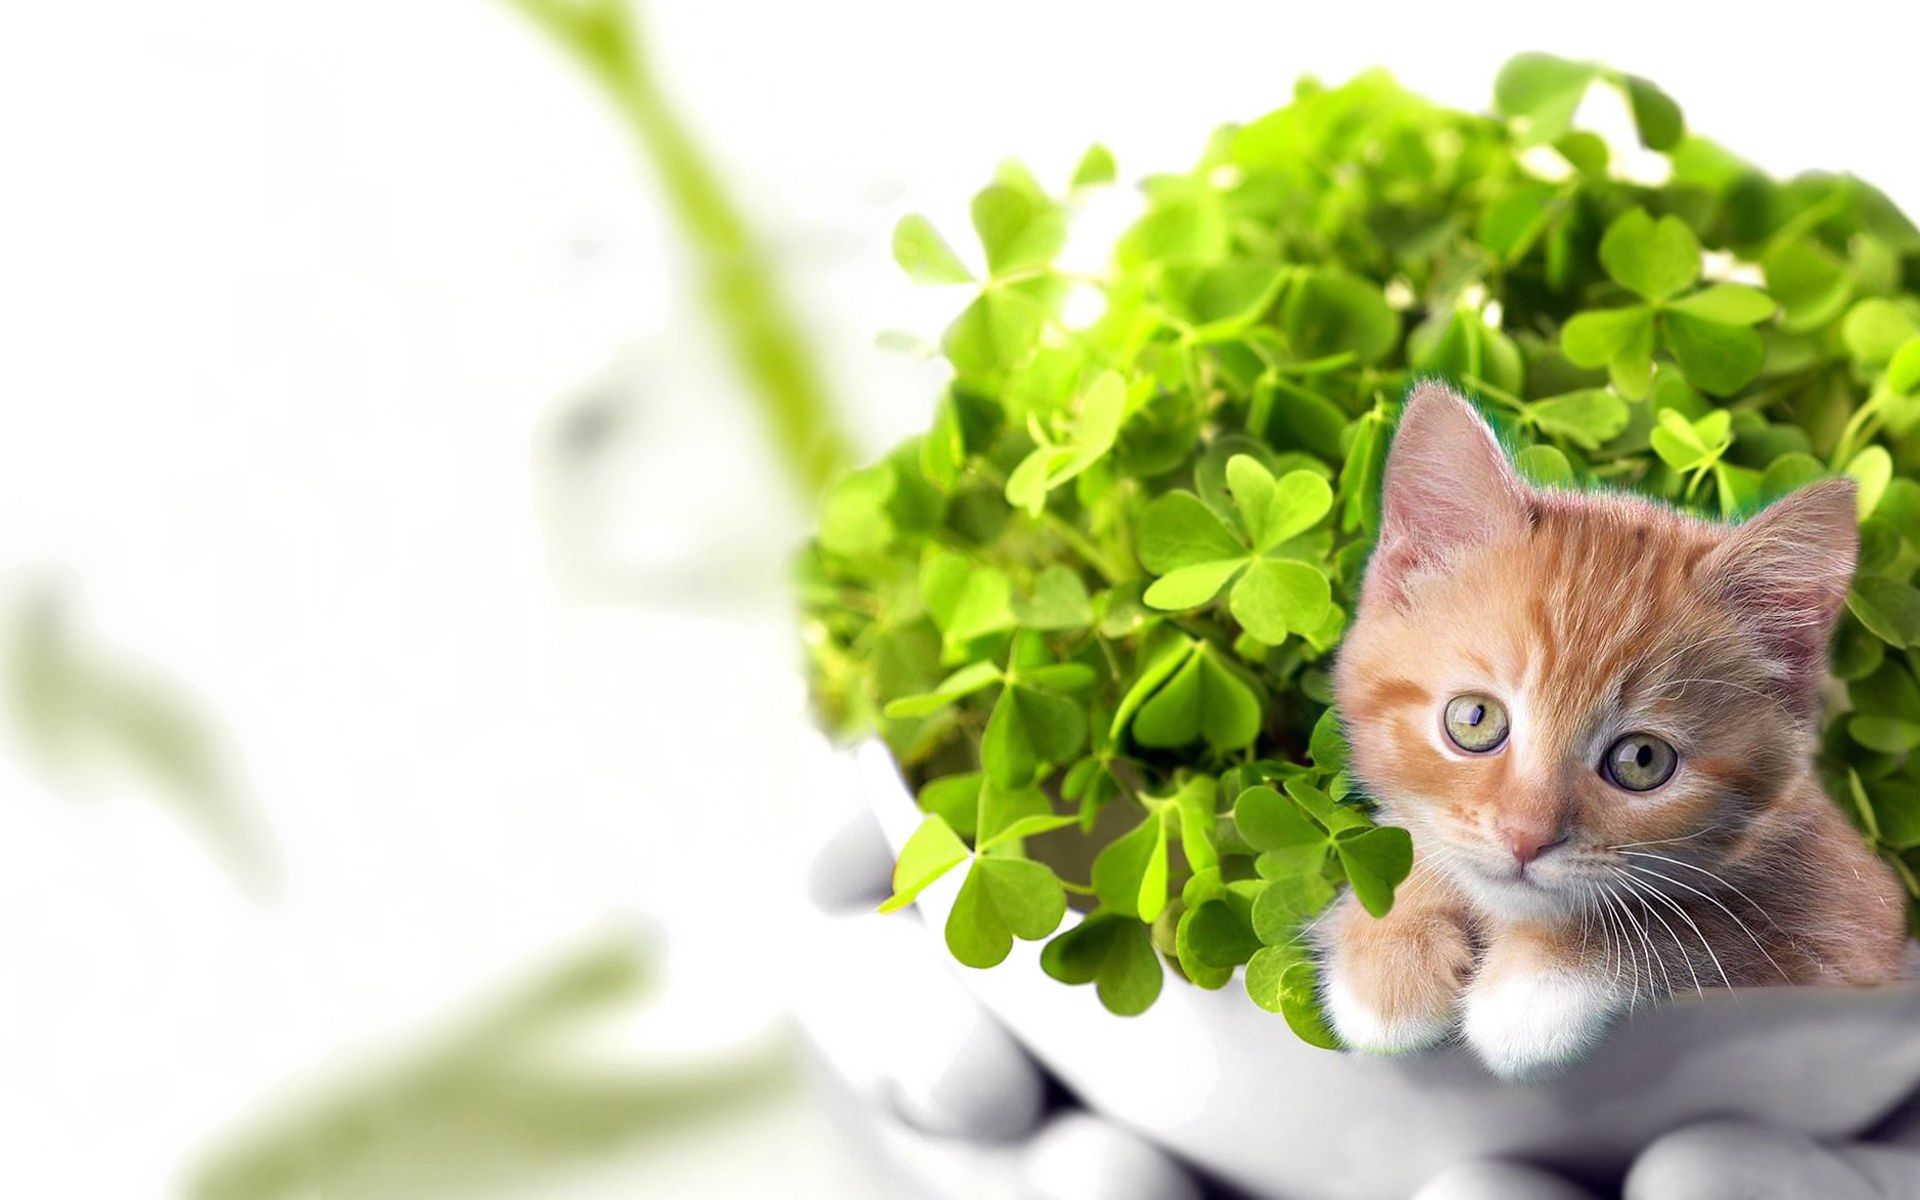 HD Lucky Kitten Wallpaper Download Free